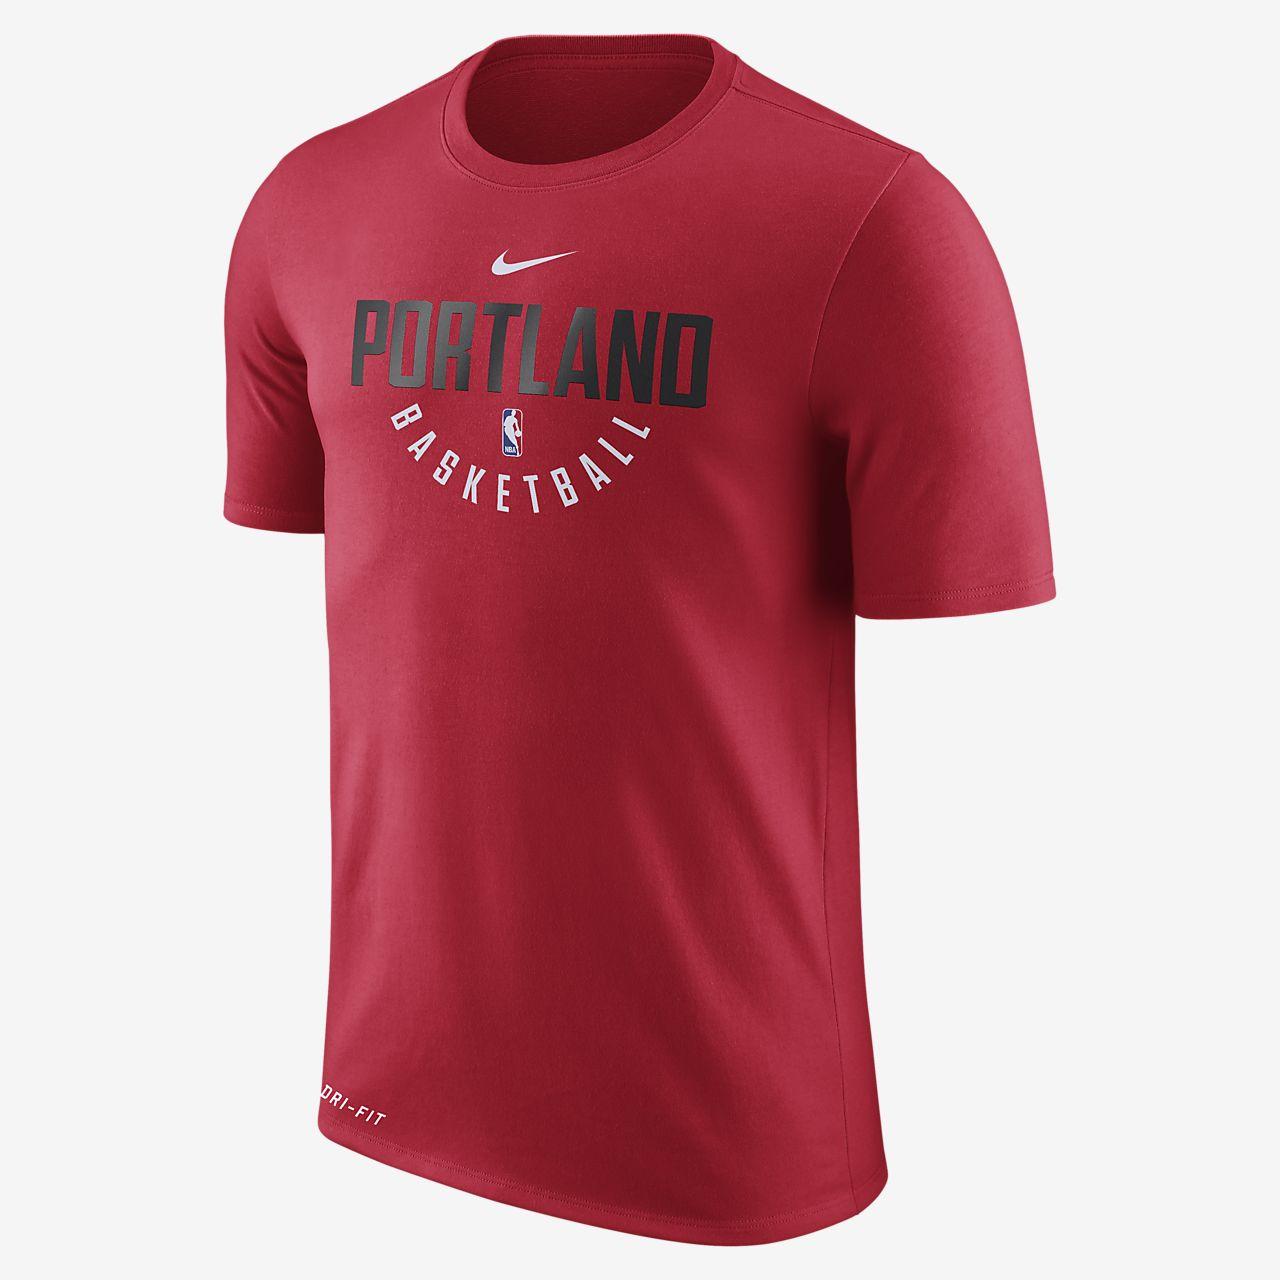 ... Portland Trail Blazers Nike Dry Men's NBA T-Shirt